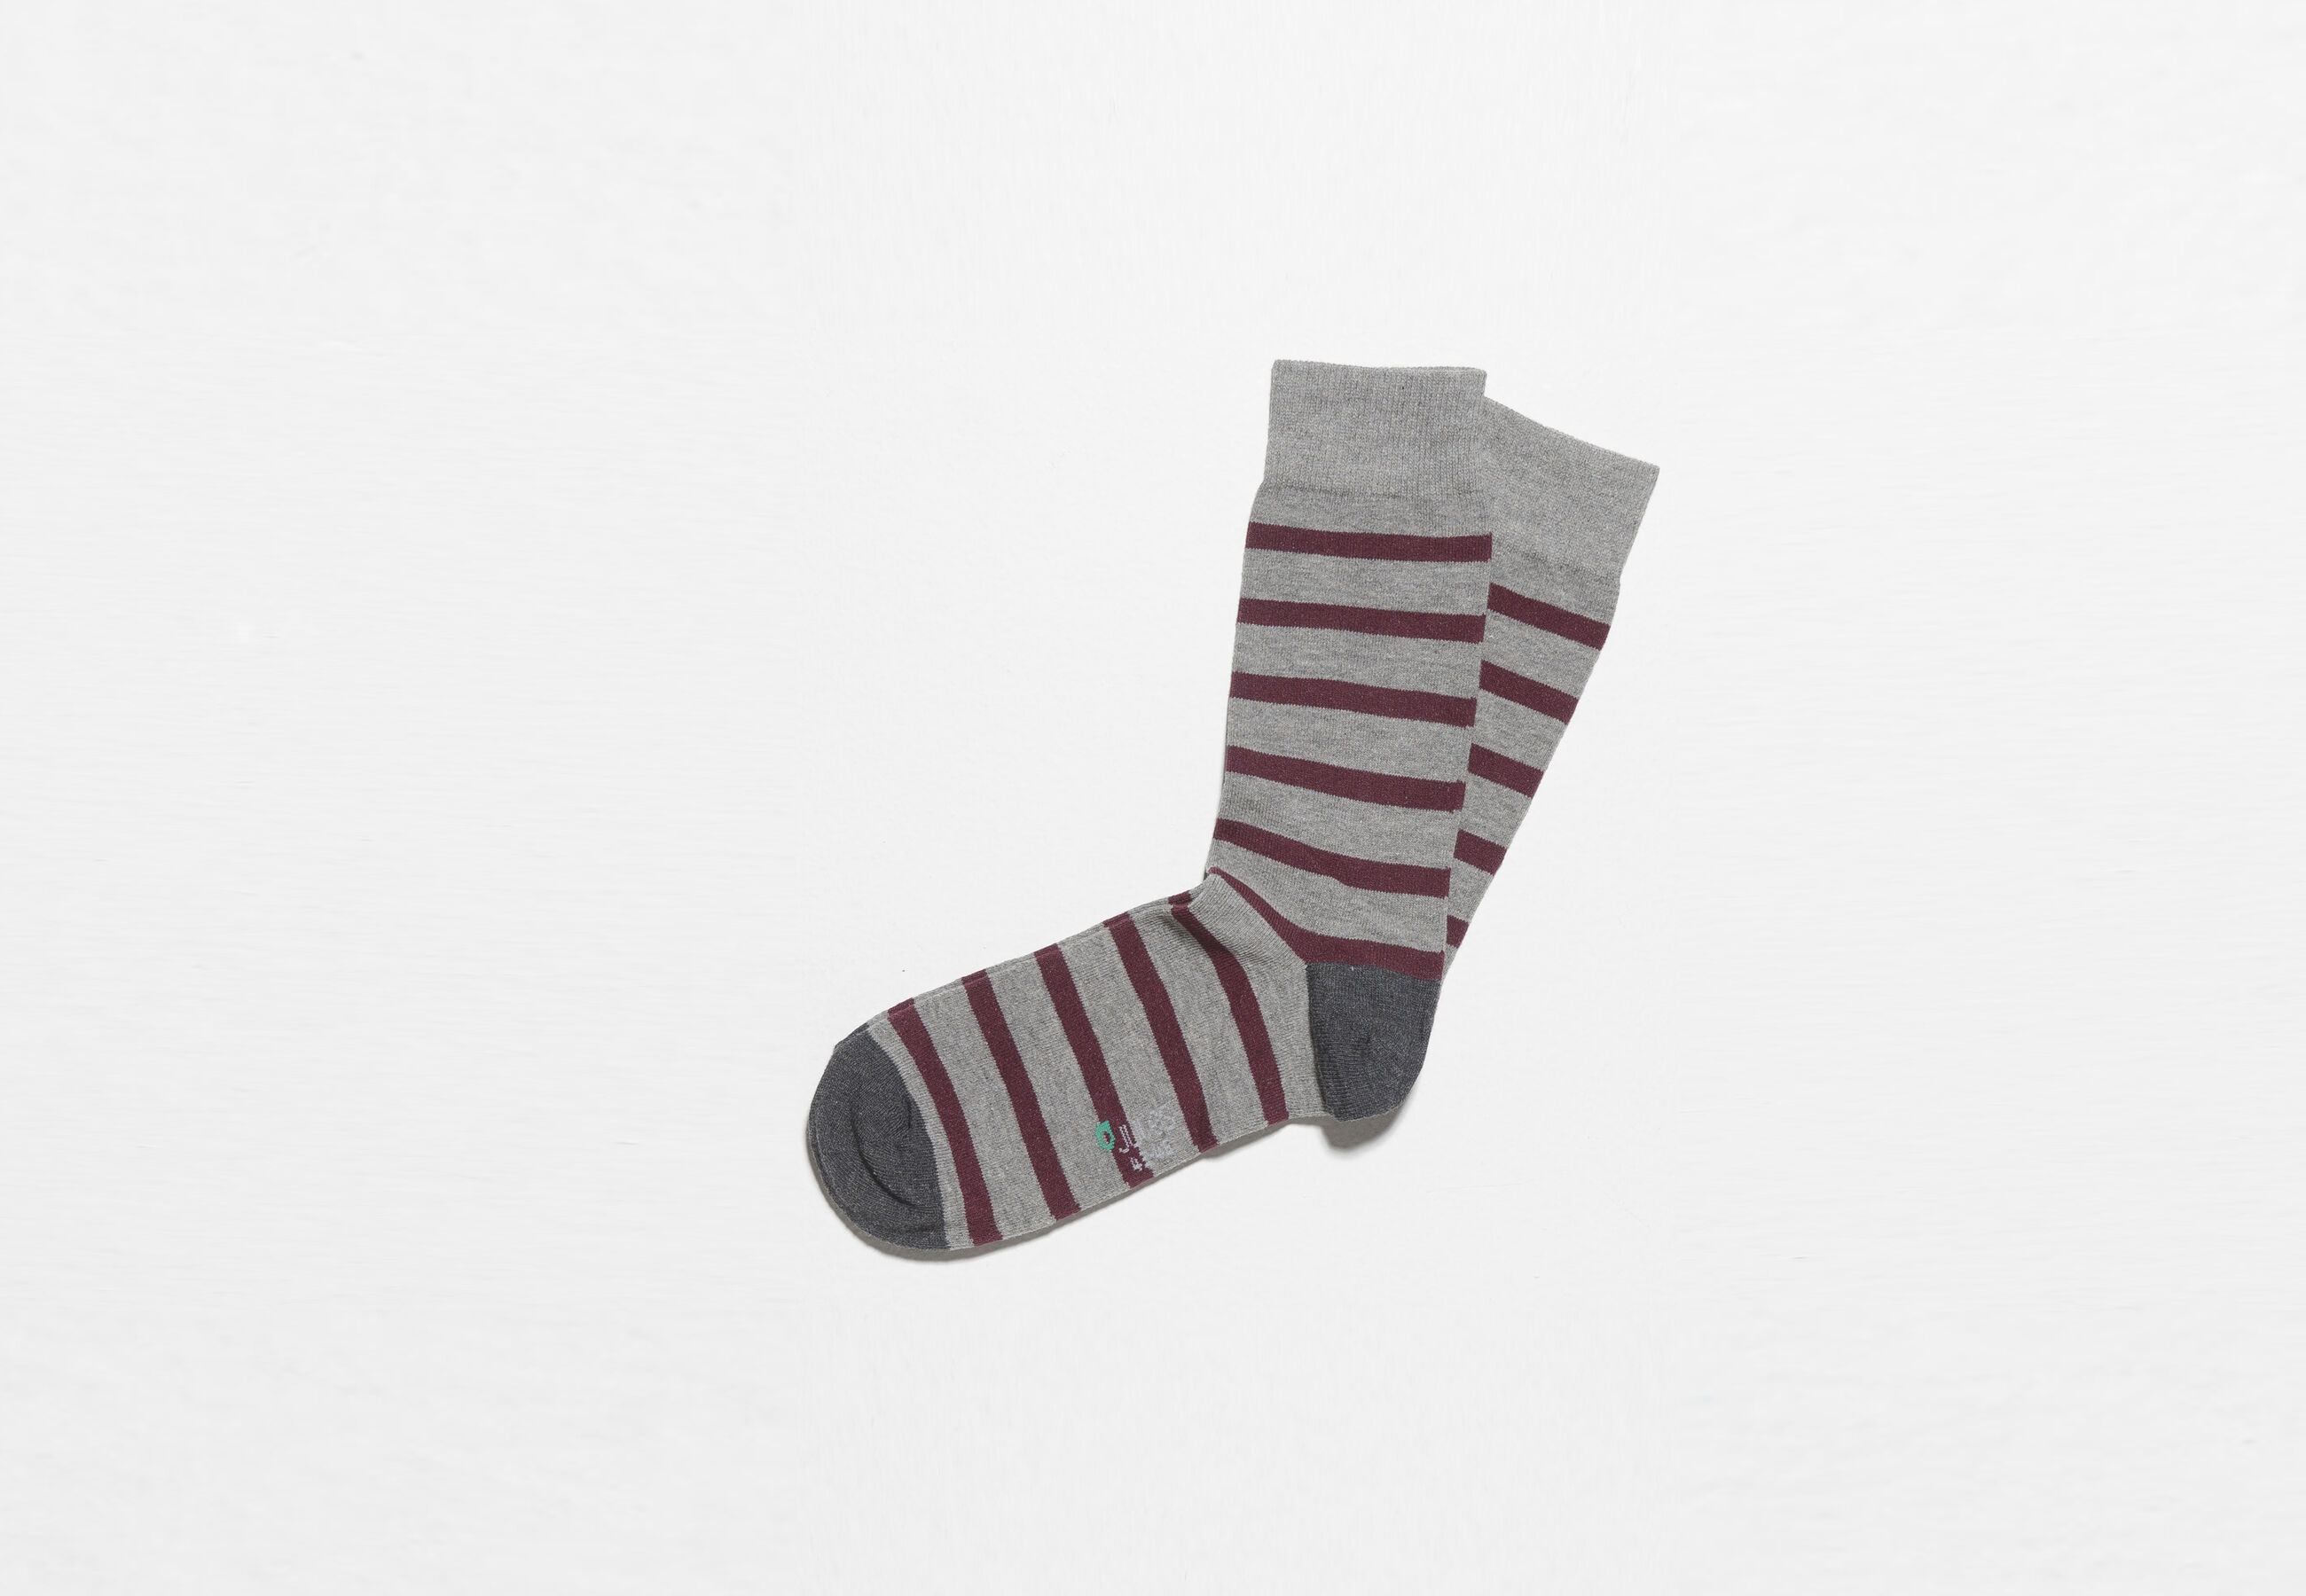 chaussettes rayures gris fantaisie homme jules. Black Bedroom Furniture Sets. Home Design Ideas